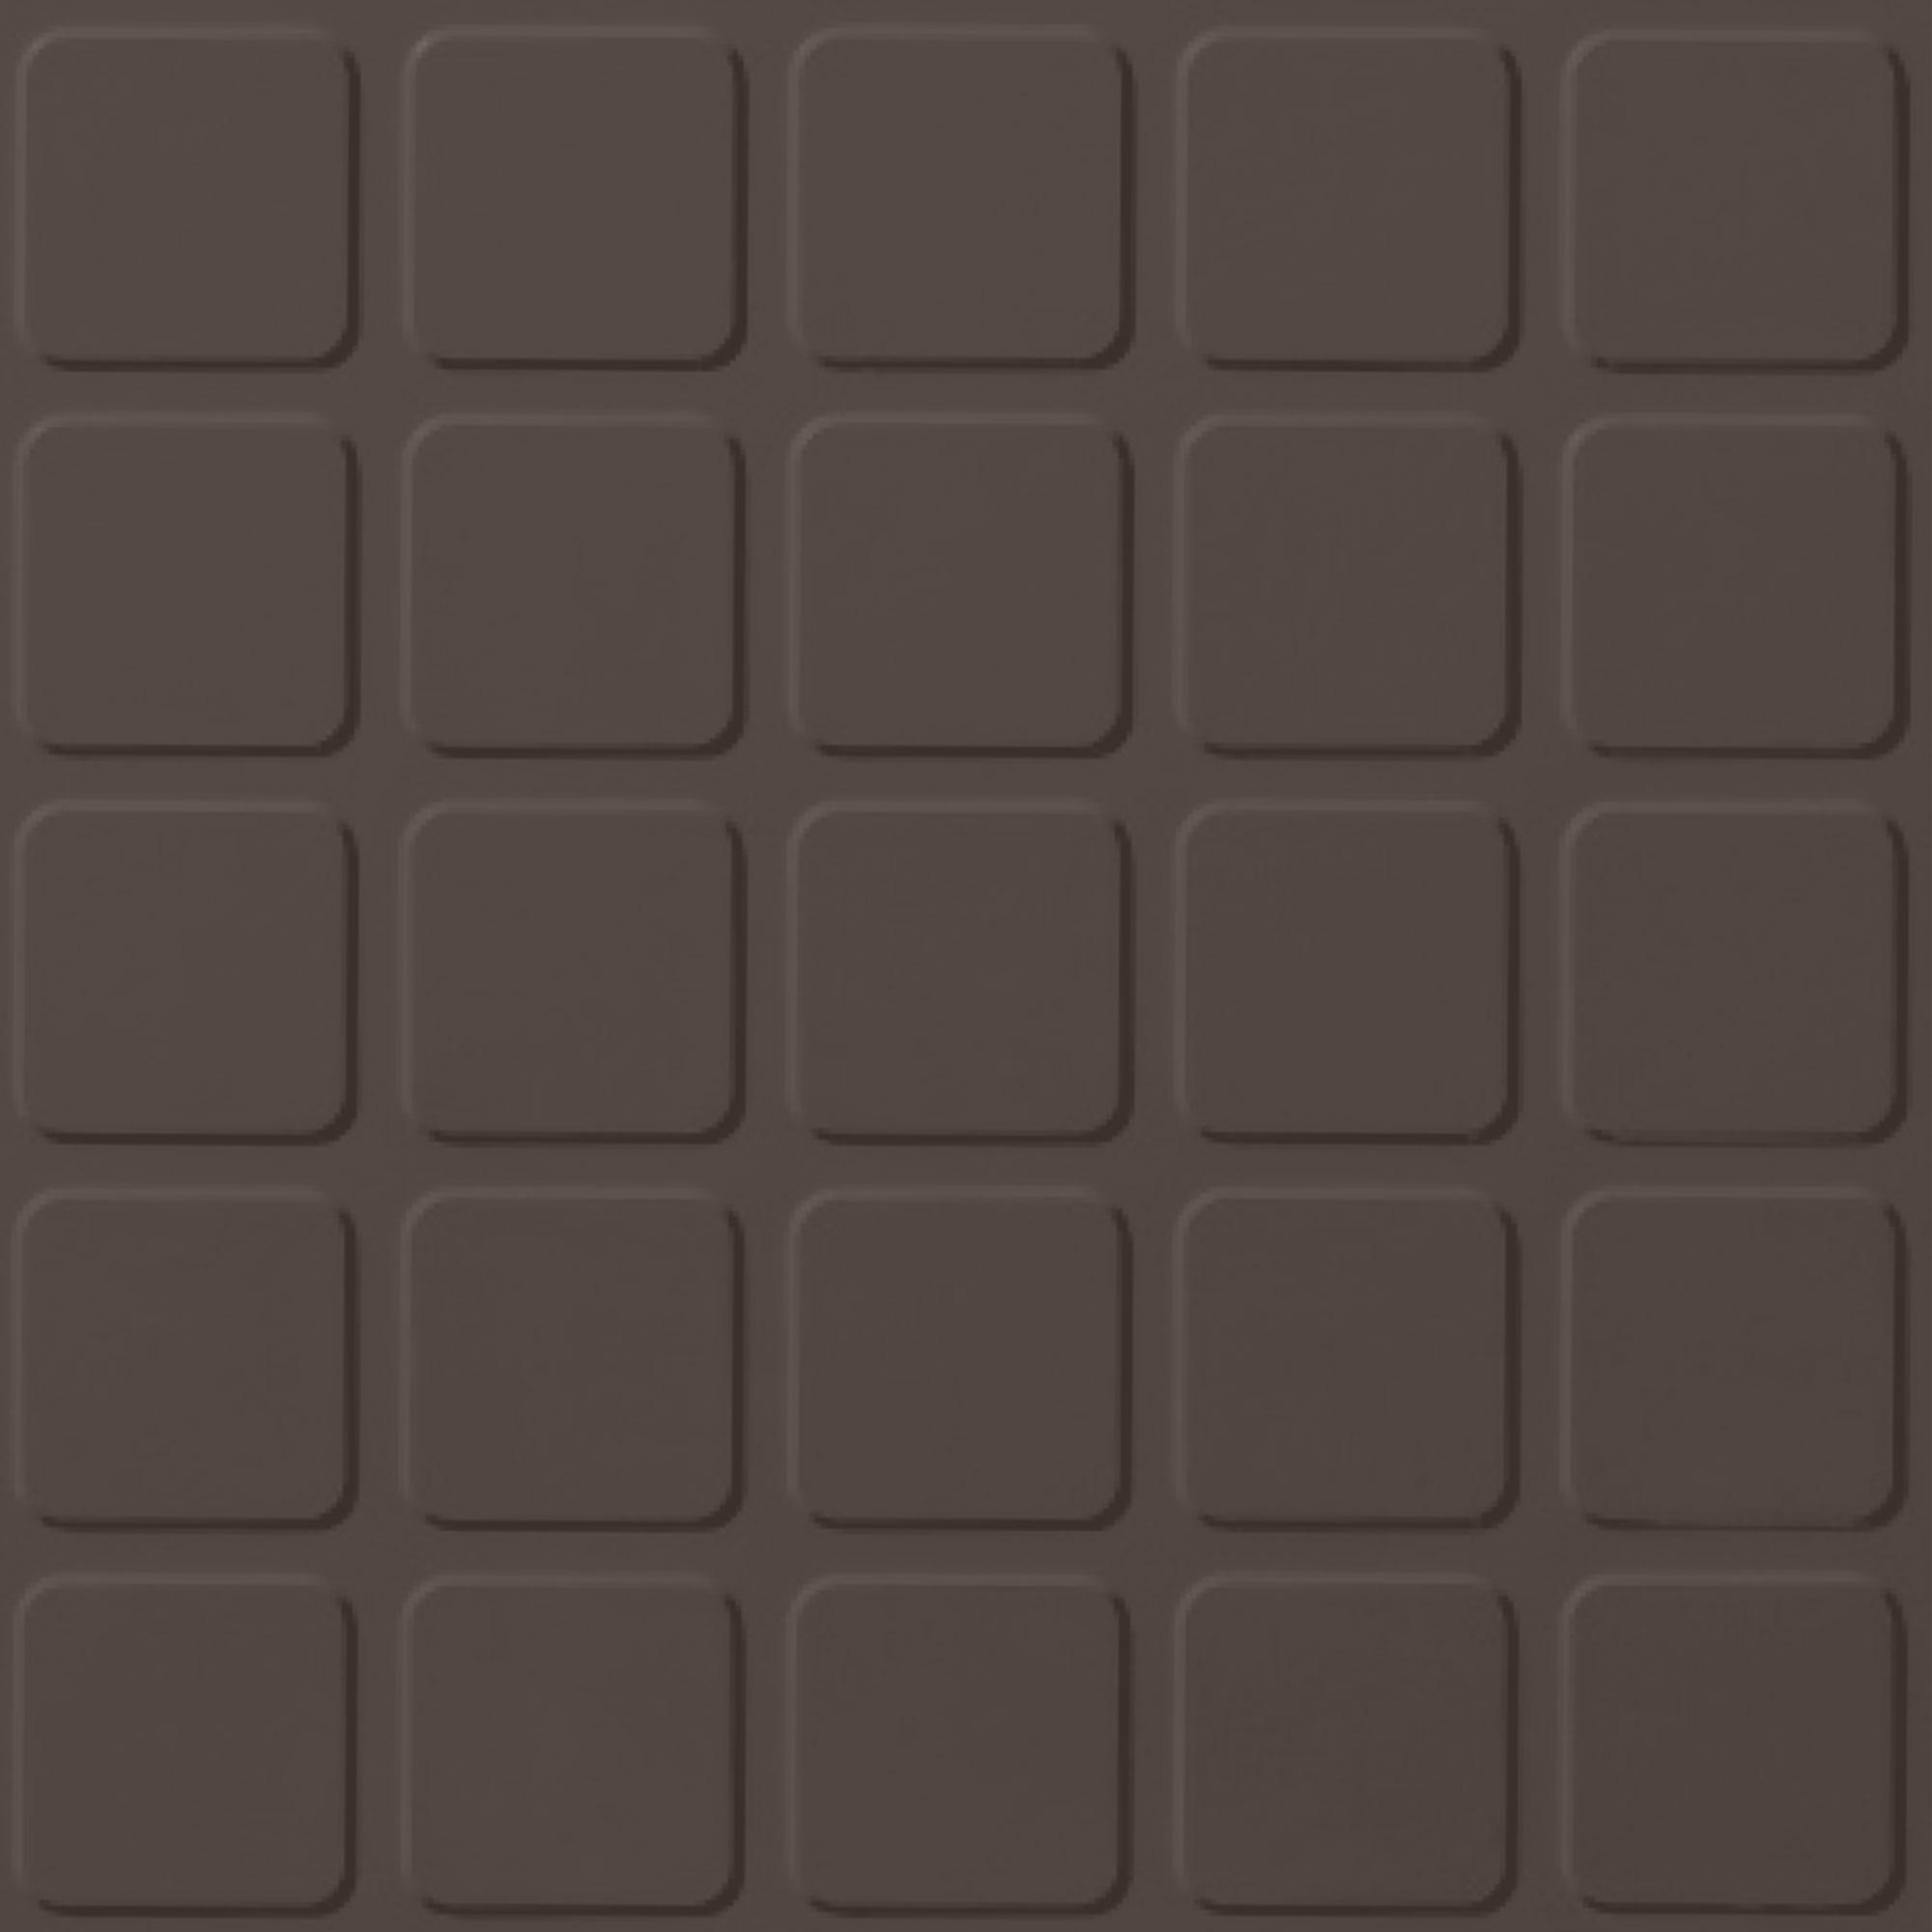 Roppe Rubber Tile 900 - Raised Square Design (994) Light Brown Rubber Flooring